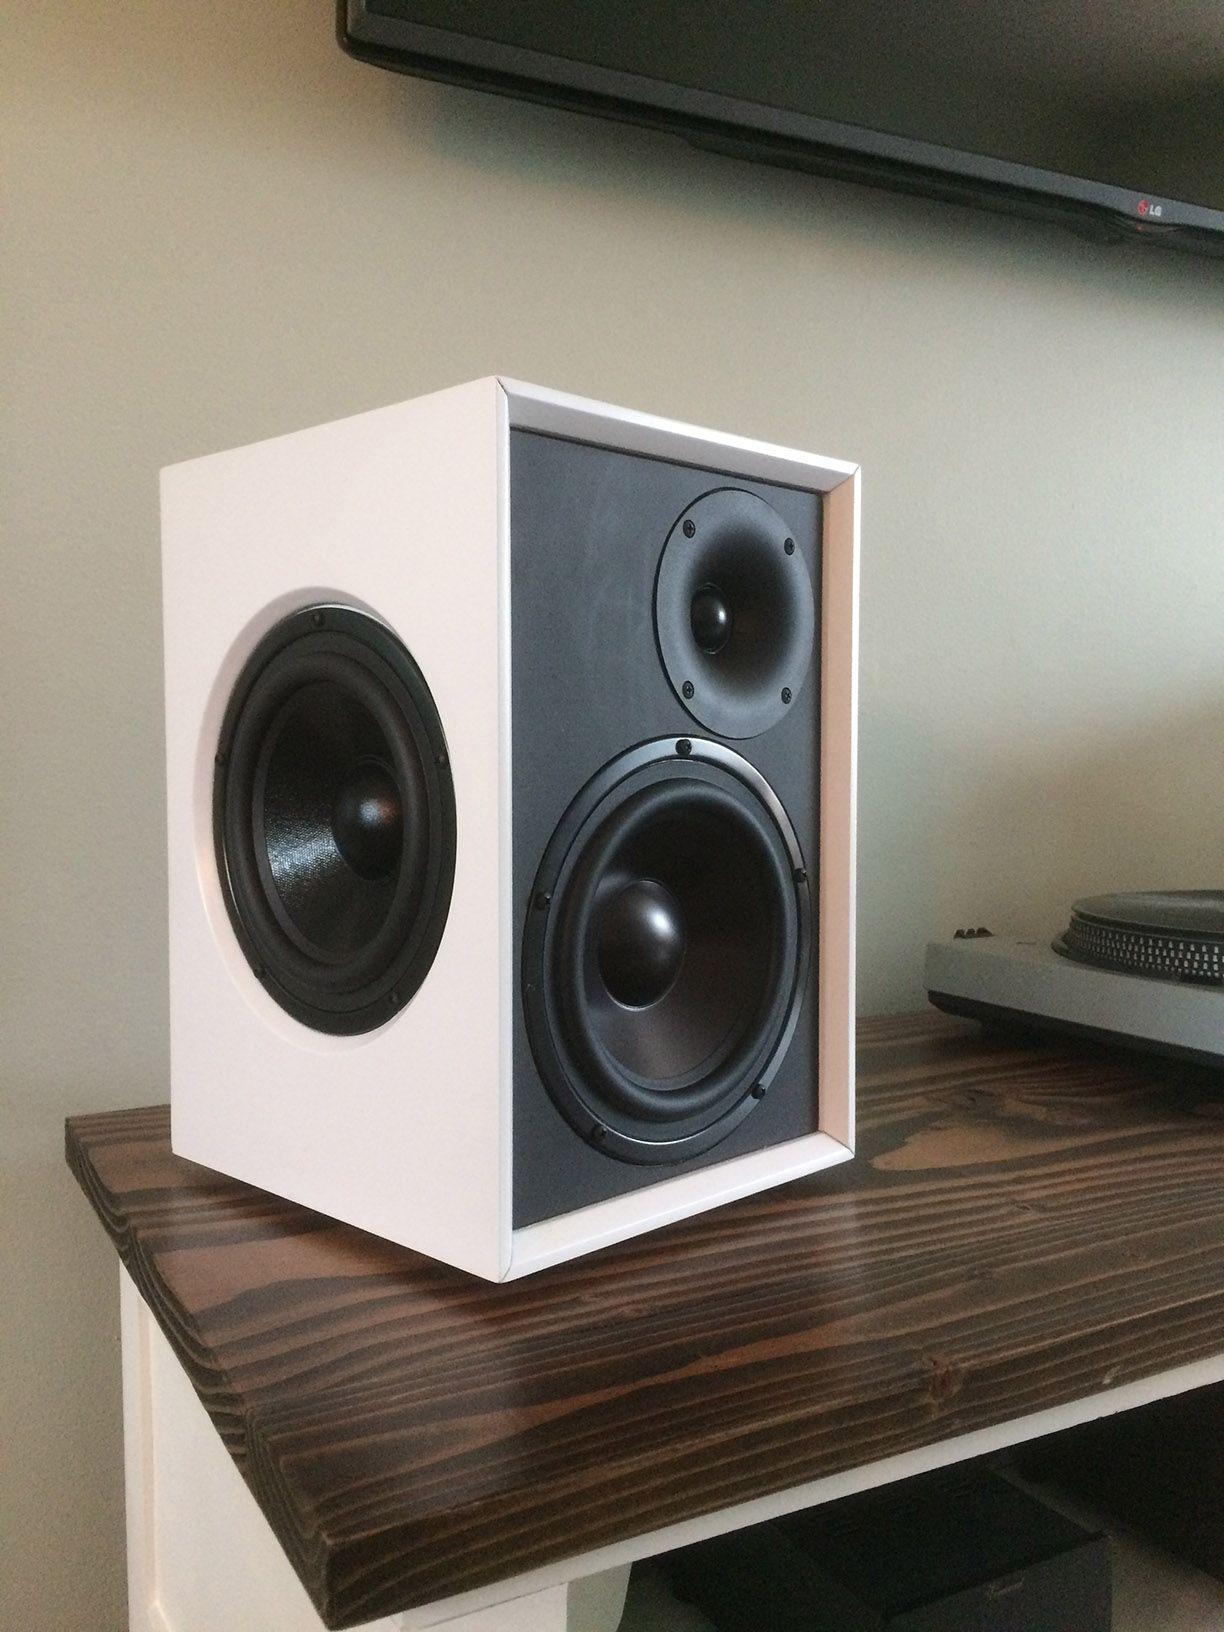 Skema box speaker woofer search results woodworking project ideas - Designer Grant Gustavsen Project Category Bookshelf Speakers Project Level Intermediate Project Time